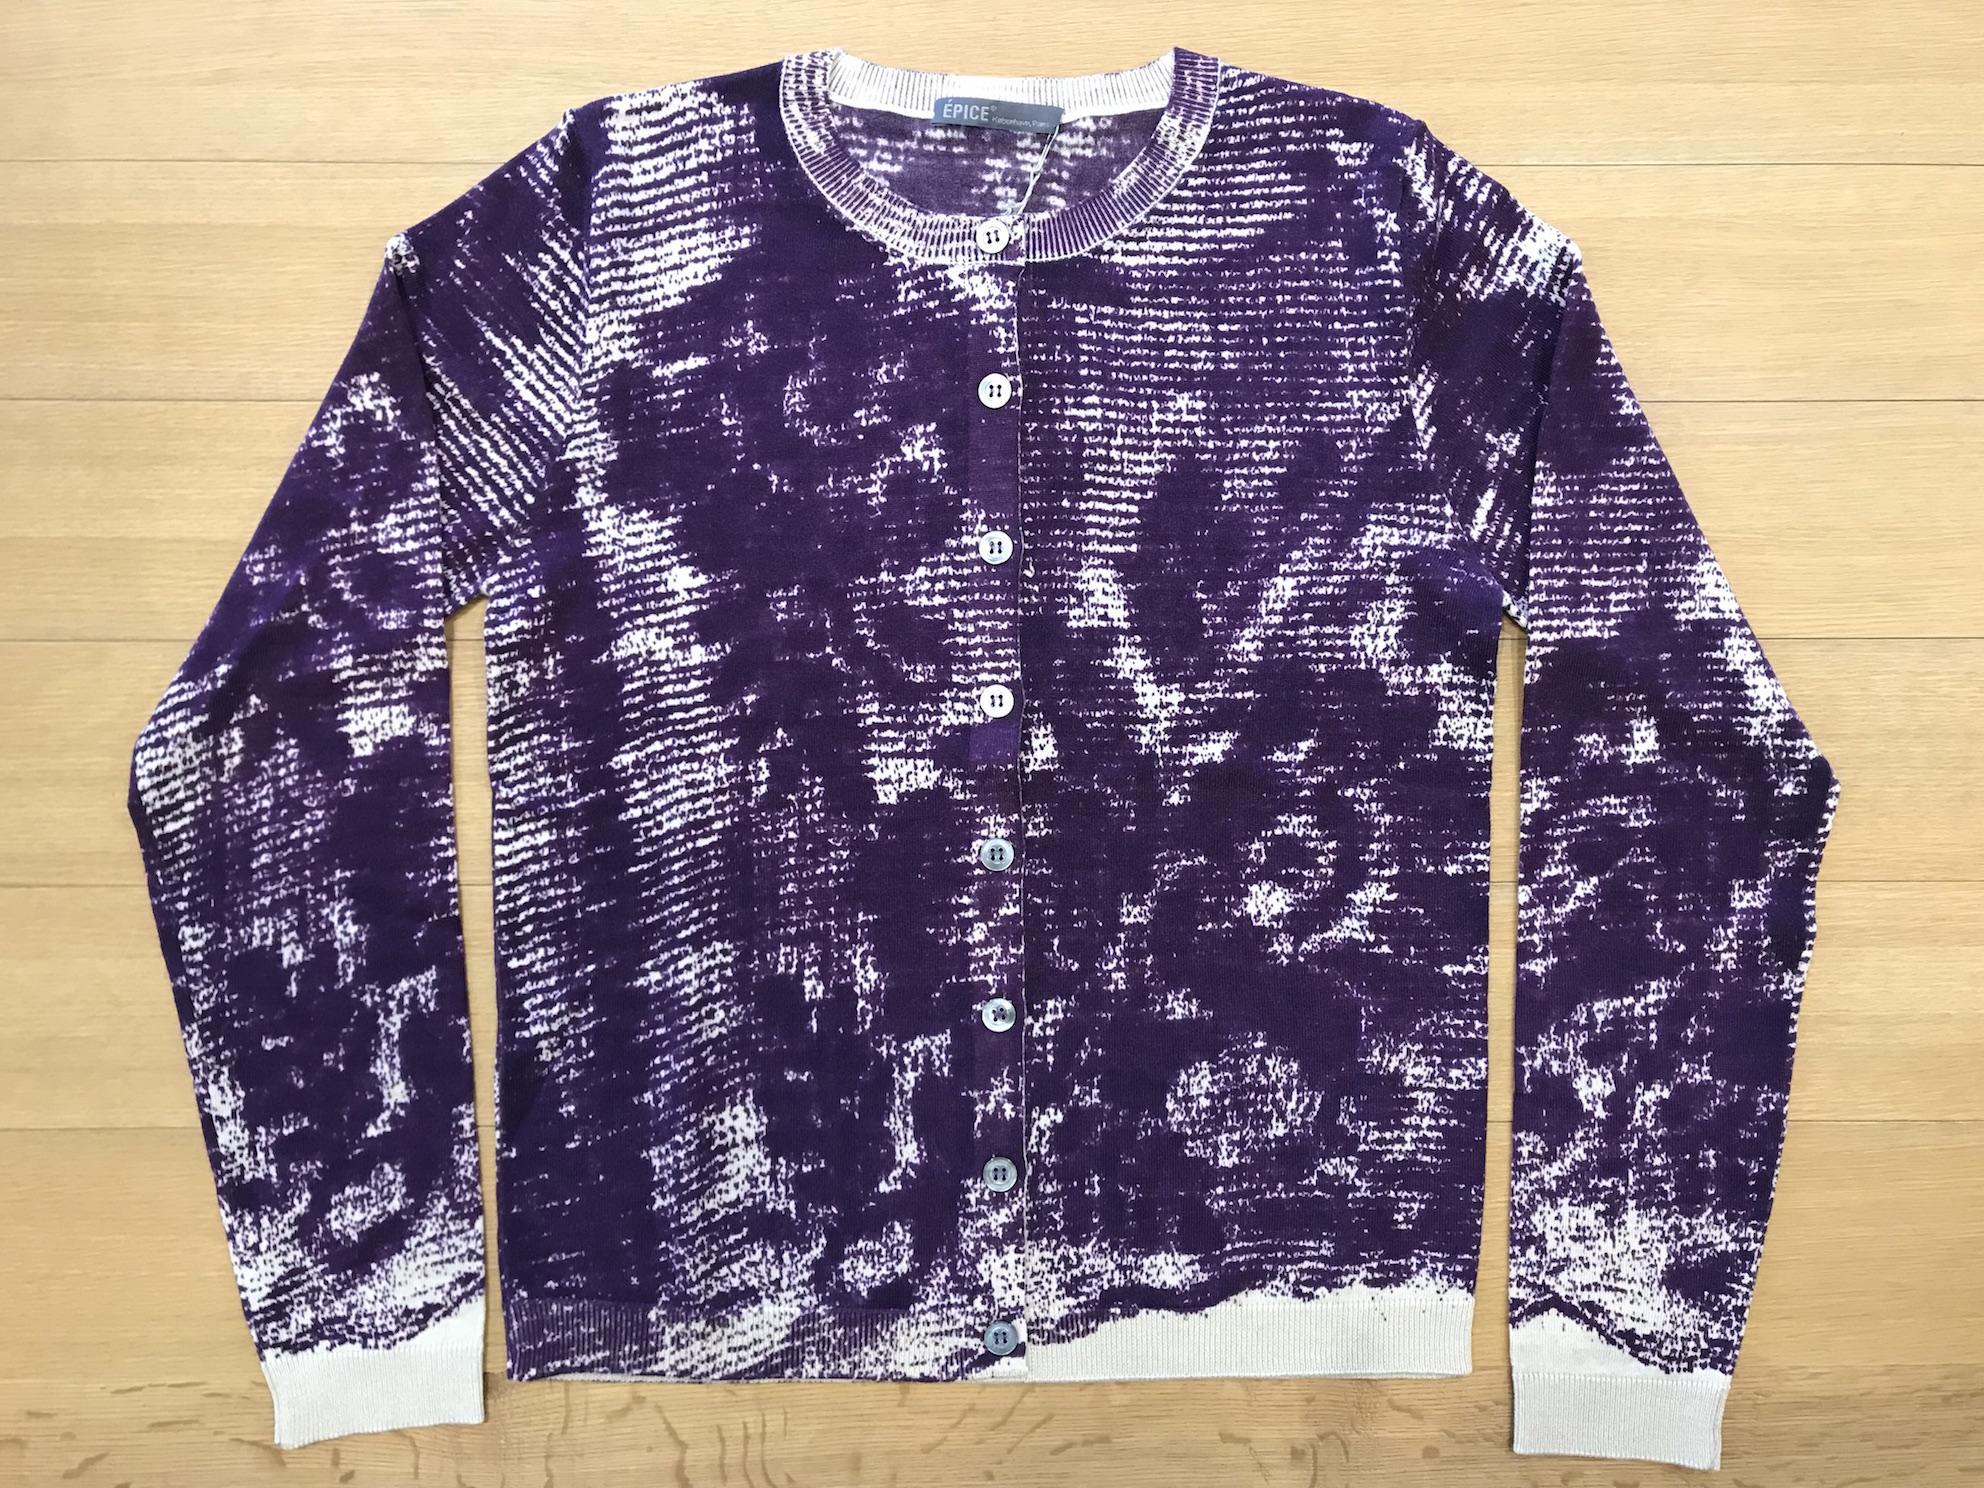 Abstract floral lace pattern アブストラクト花レース柄 カーディガン CA1360-01